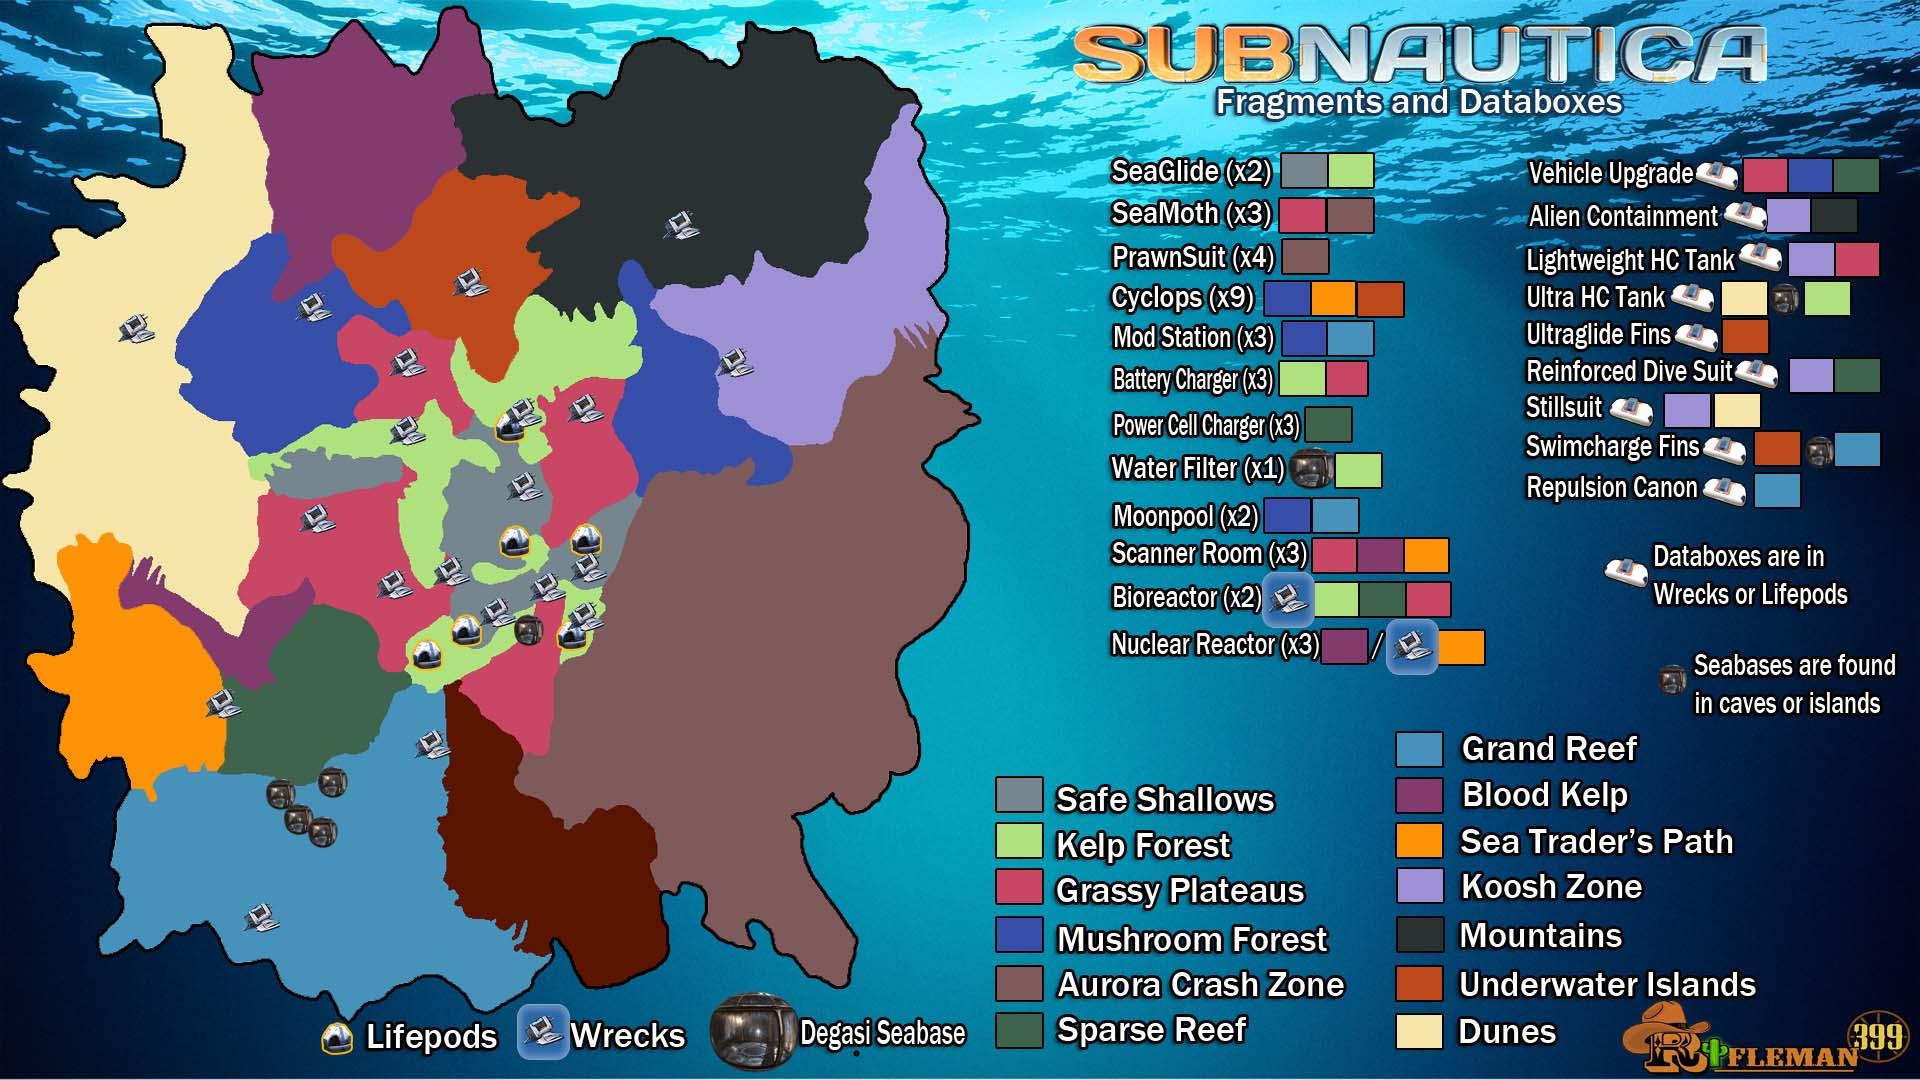 Subnautica Karte.Subnautica 2018 Biome Map Hd Wallpapers